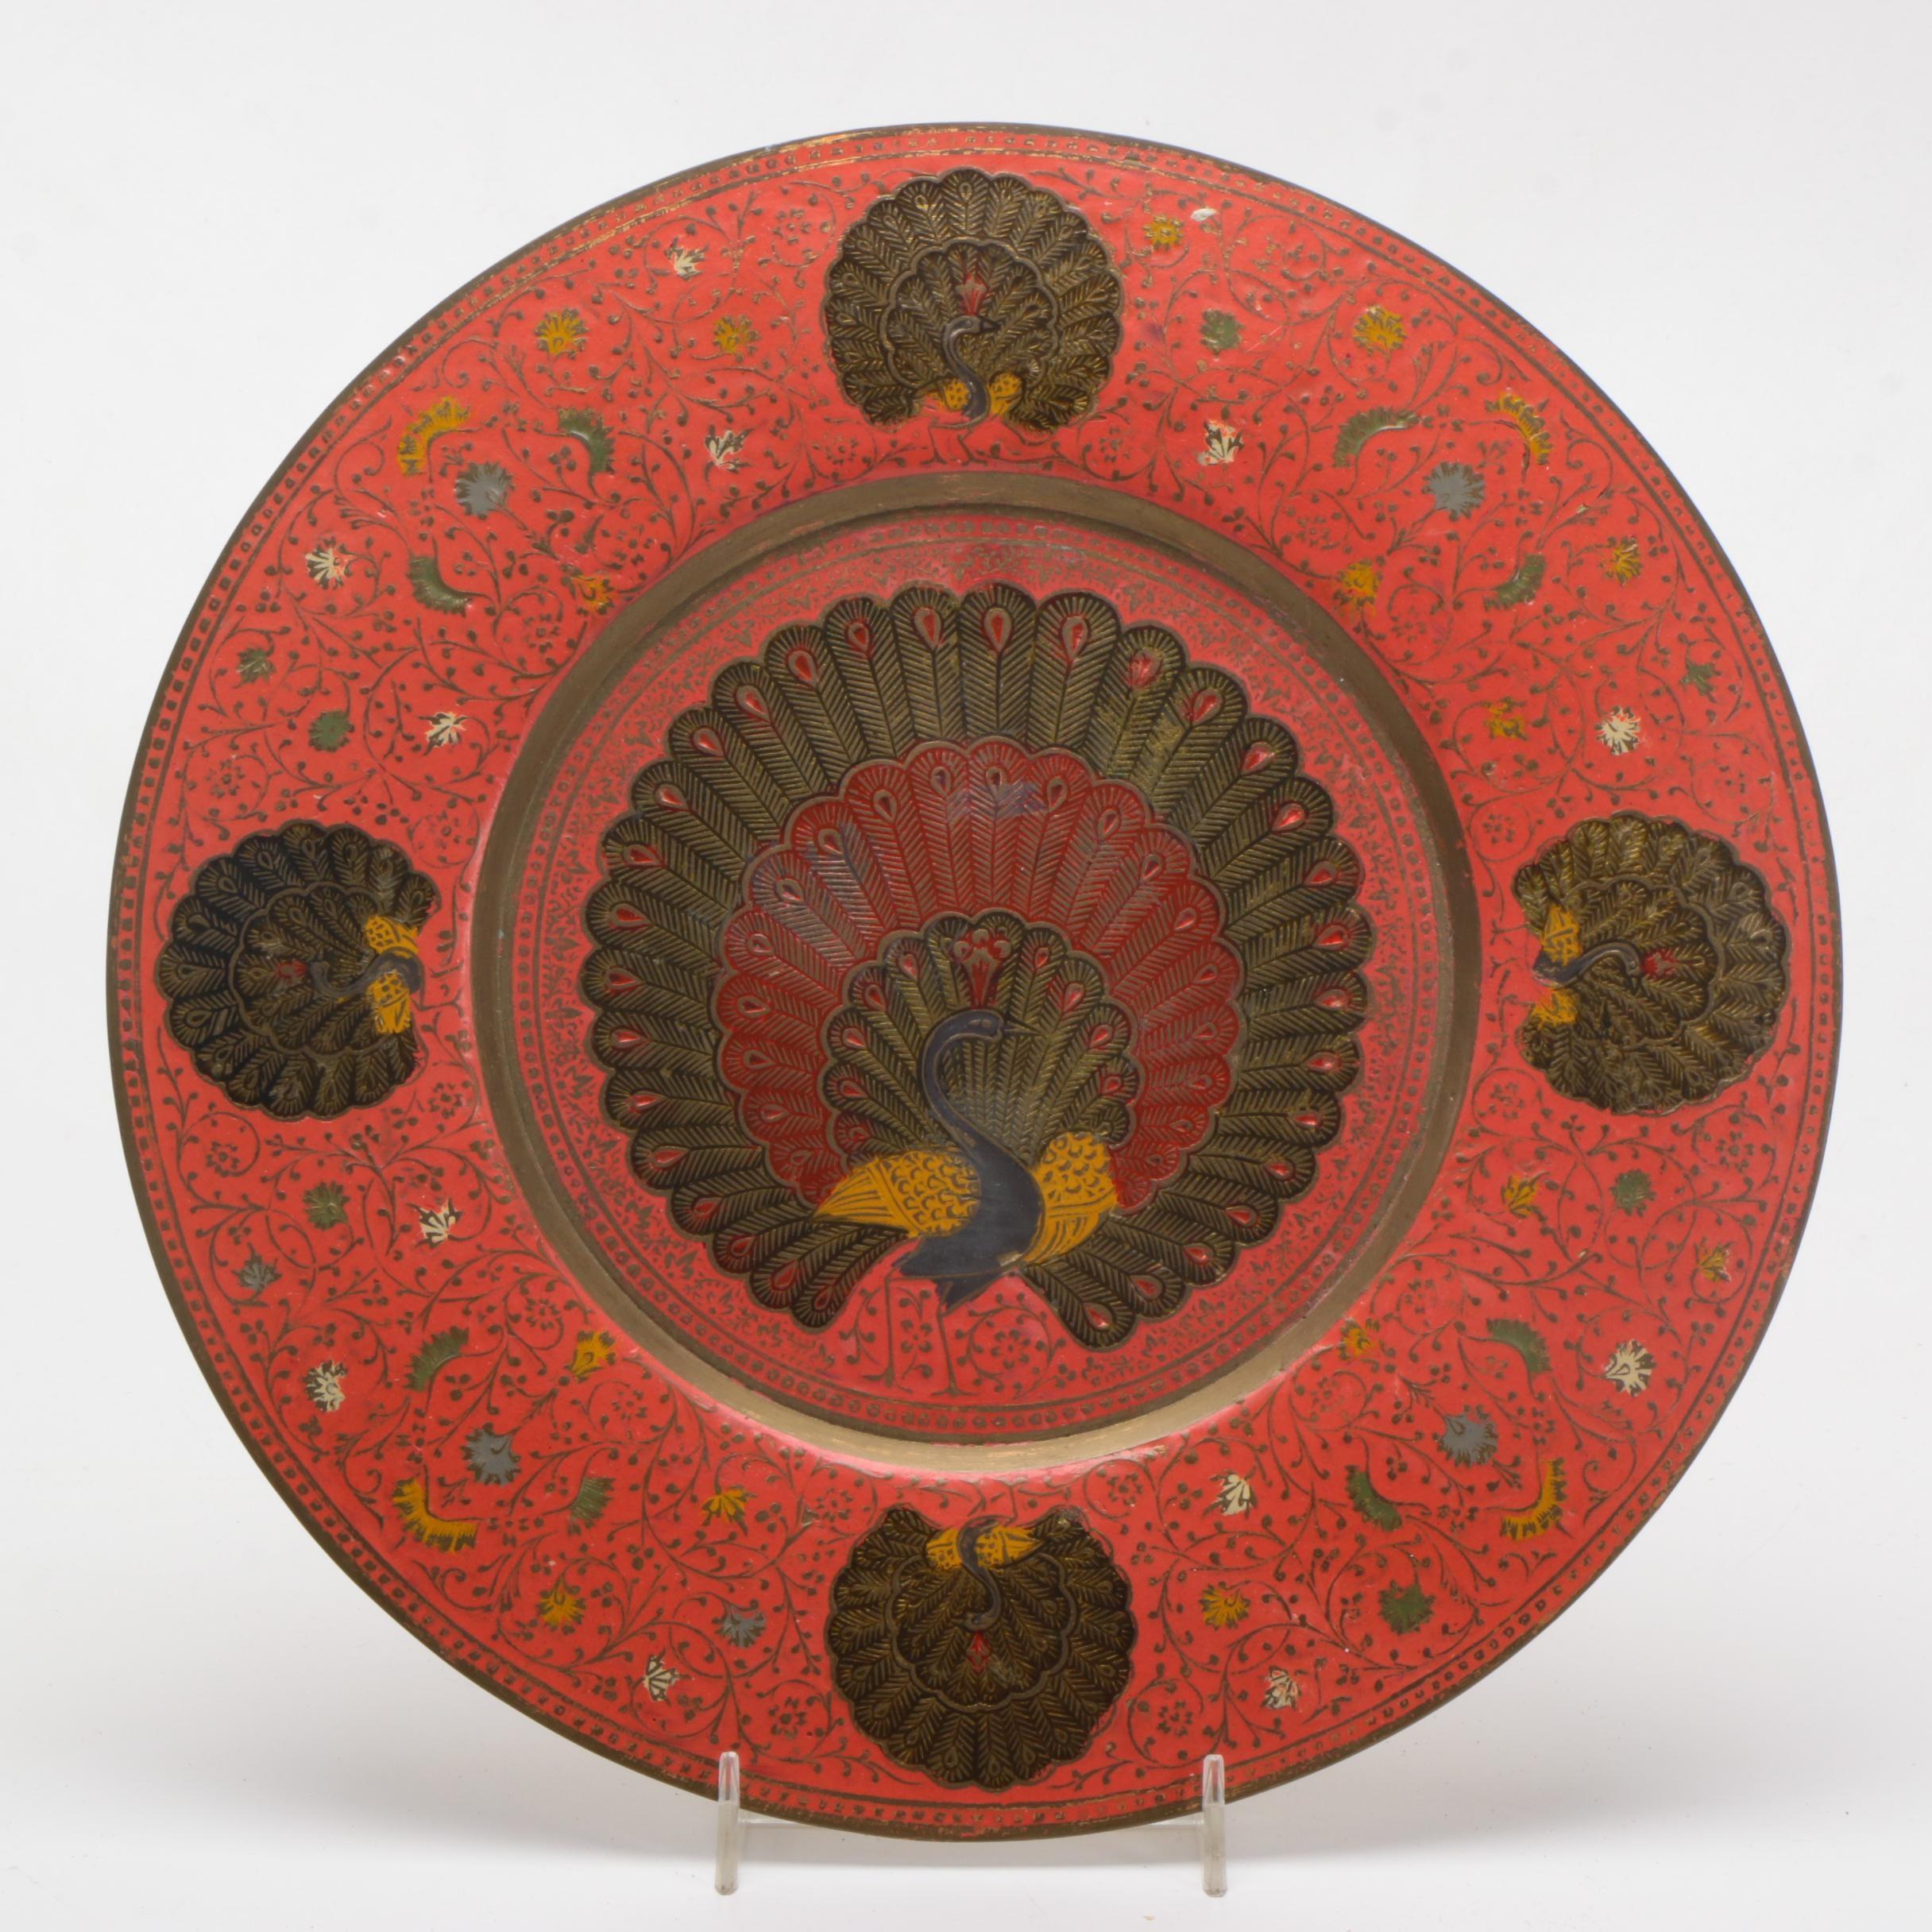 Hand-Painted Peacock Vintage Metal Decorative Plate